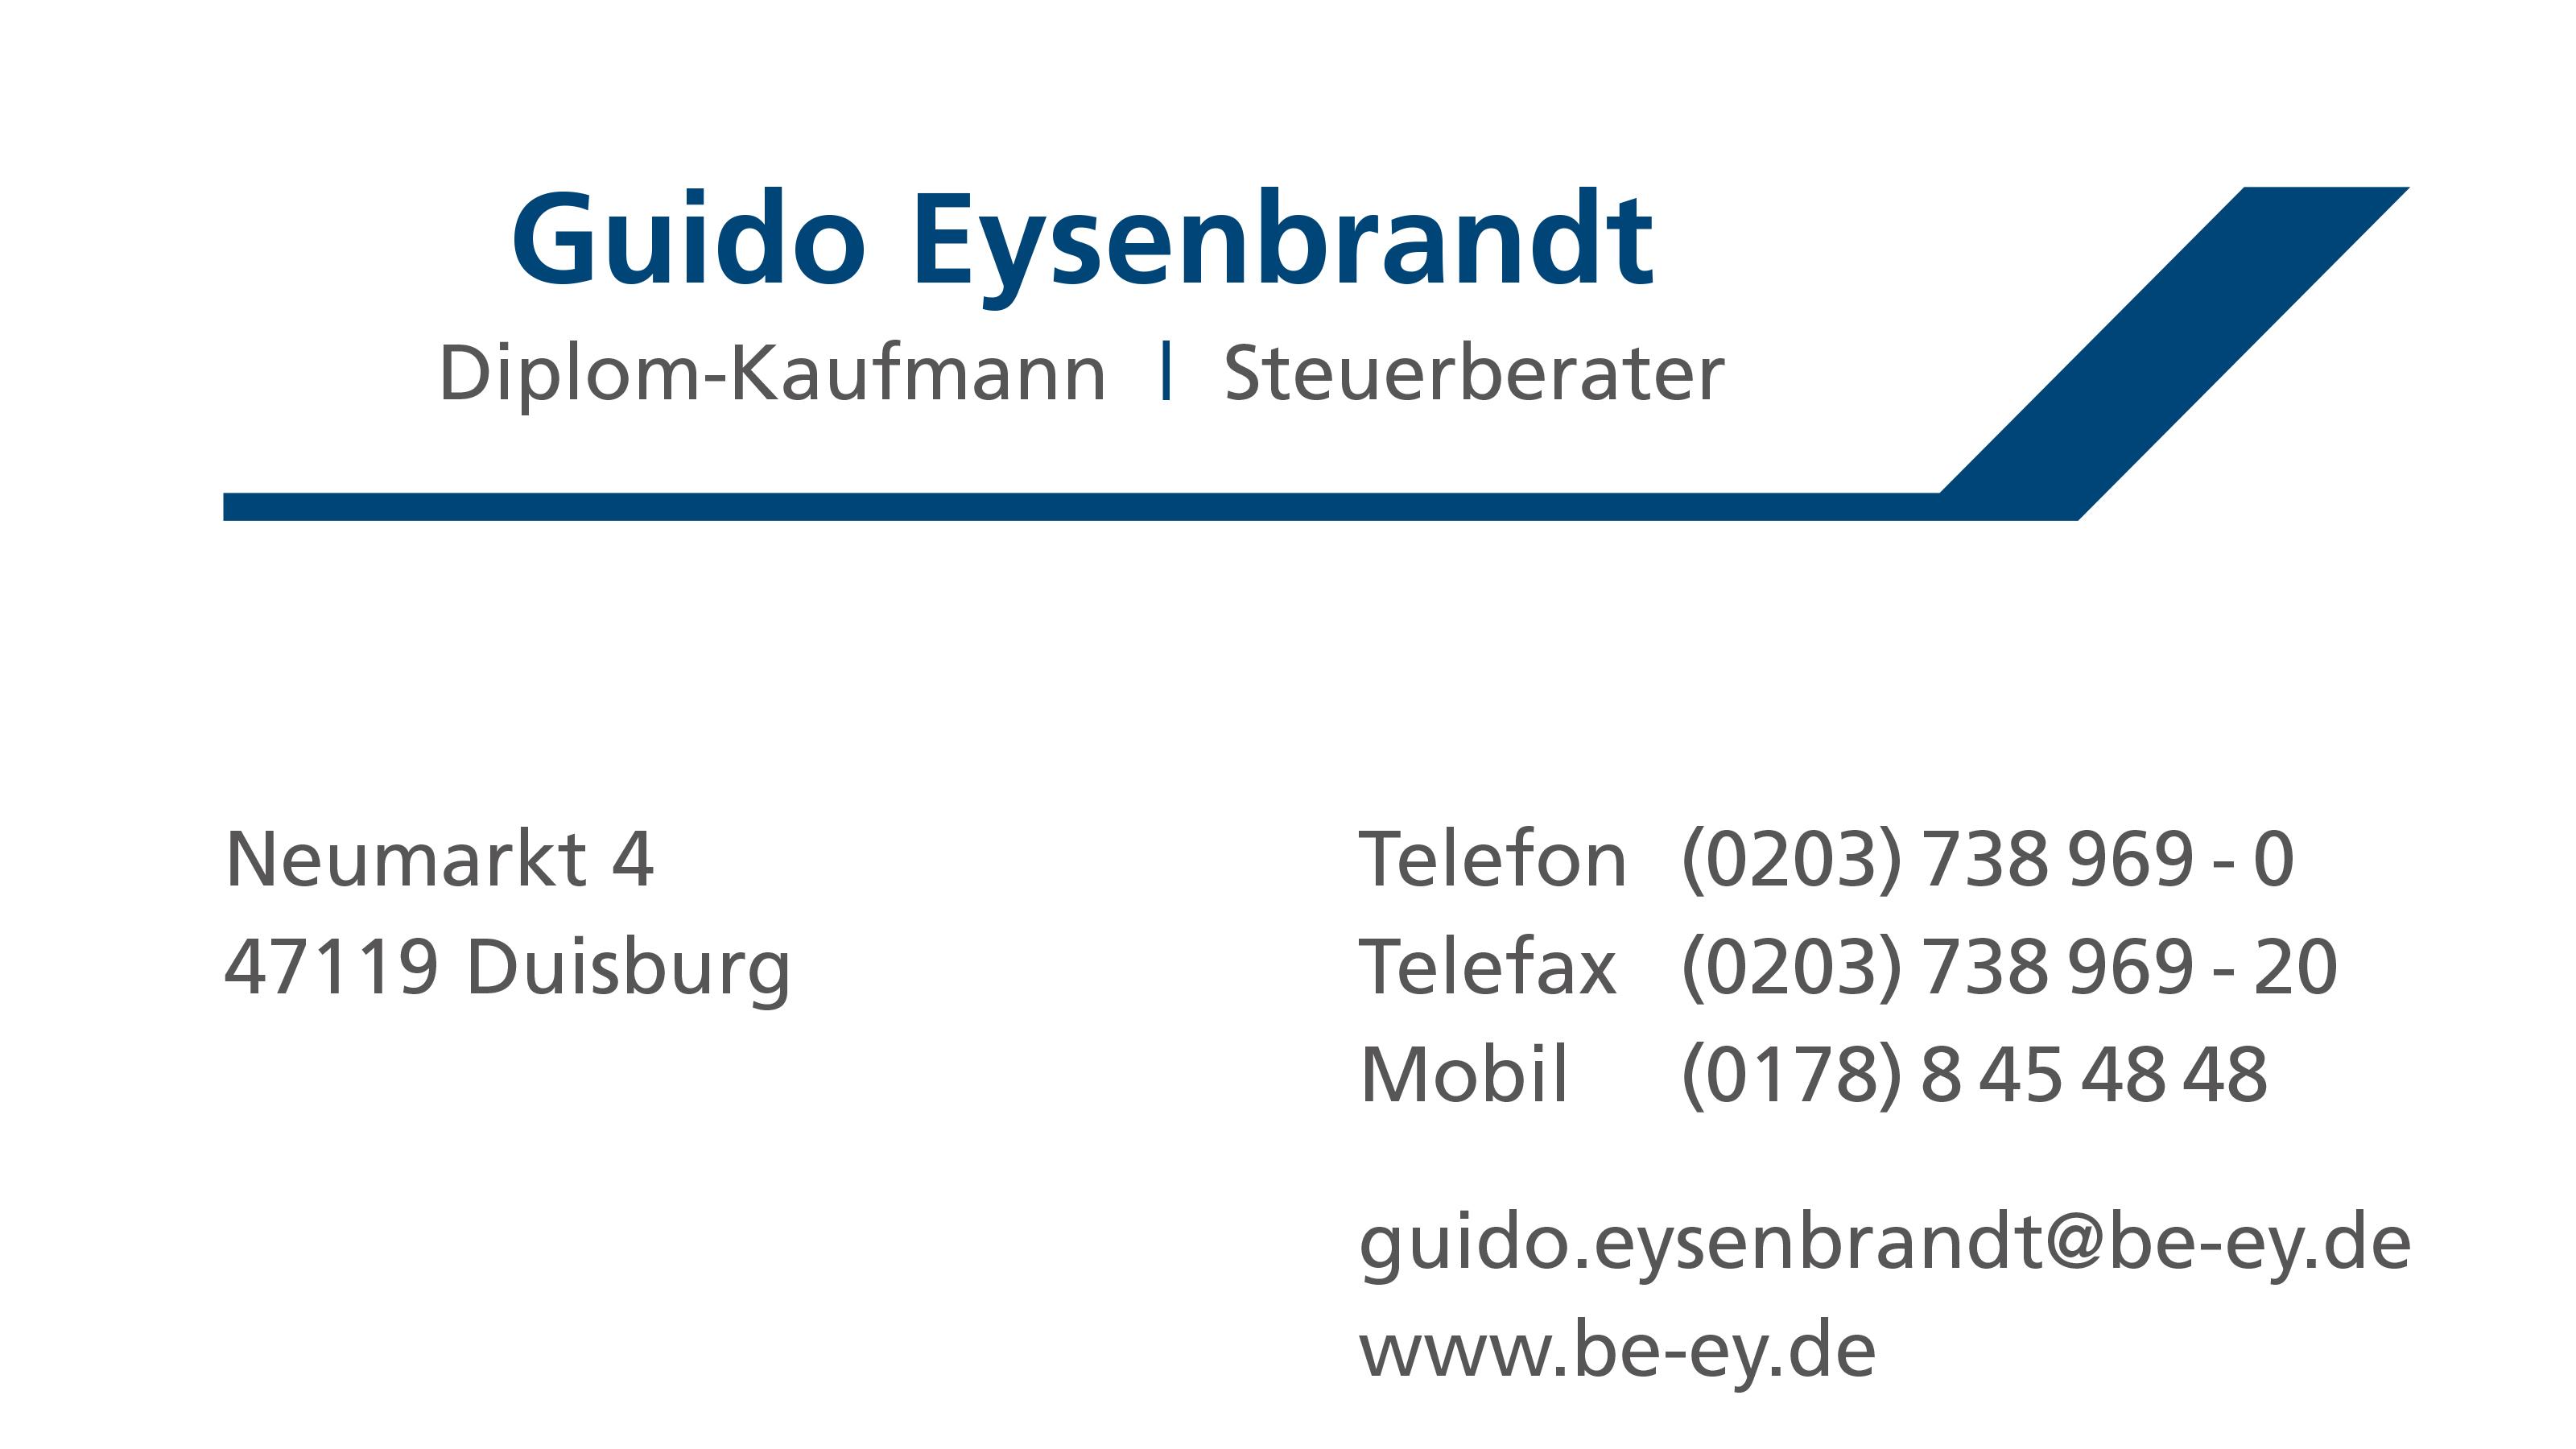 Steuerberater Guido Eysenbrandt